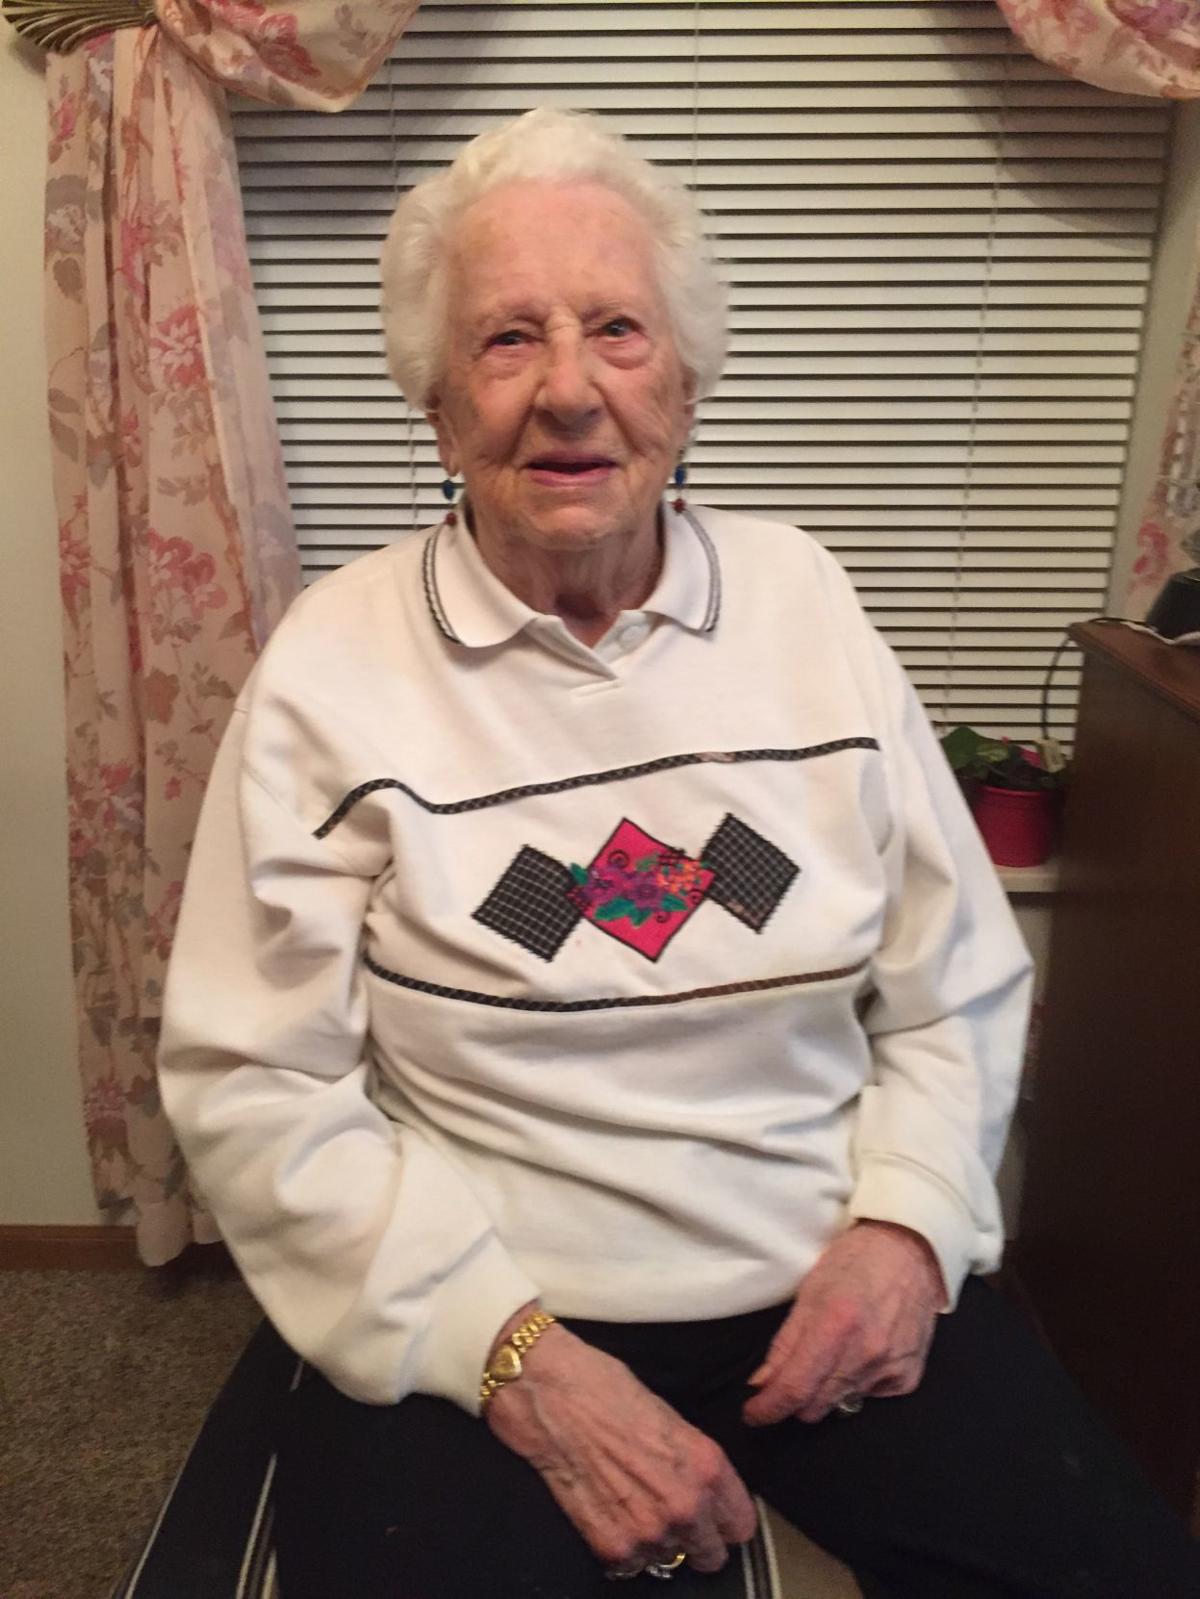 Maxine Rice celebrates her 100th birthday